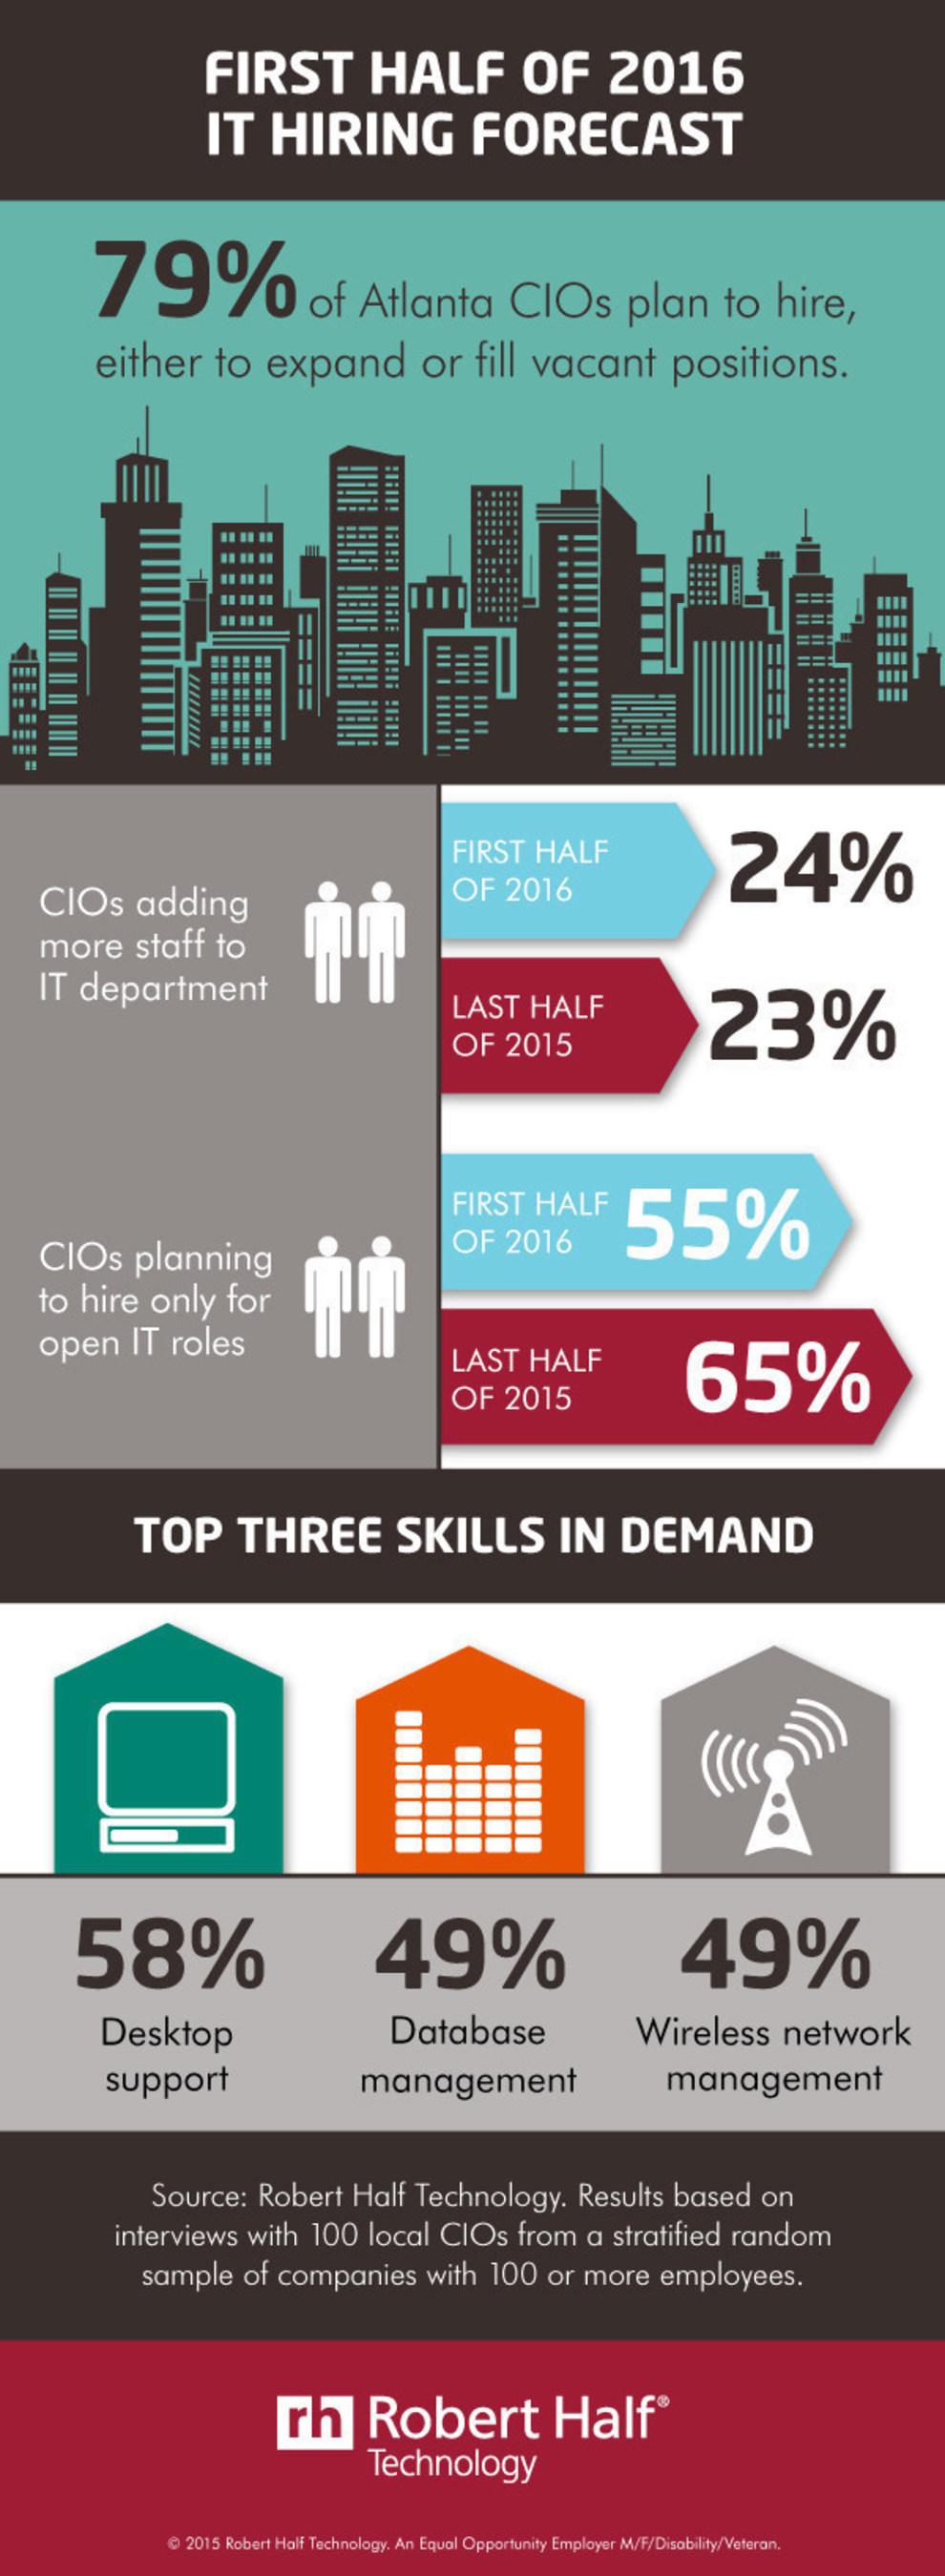 Atlanta CIOs Reveal Hiring Plans for First Half of 2016